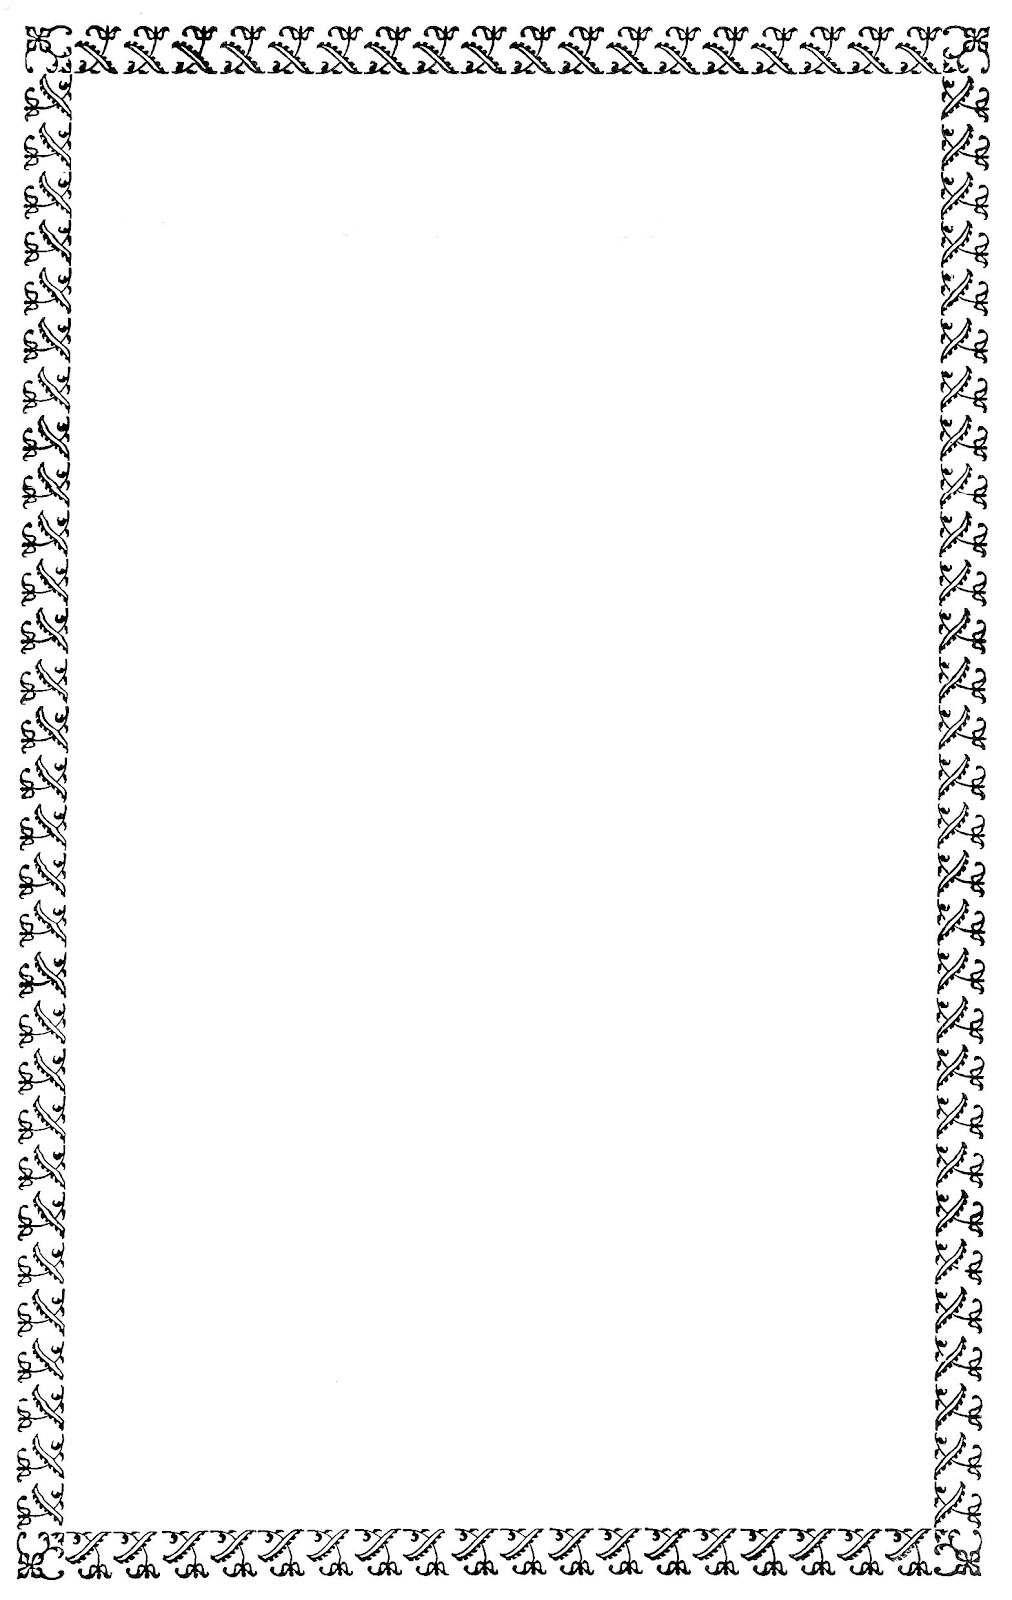 Diamonds clipart banner. Free borders clip art